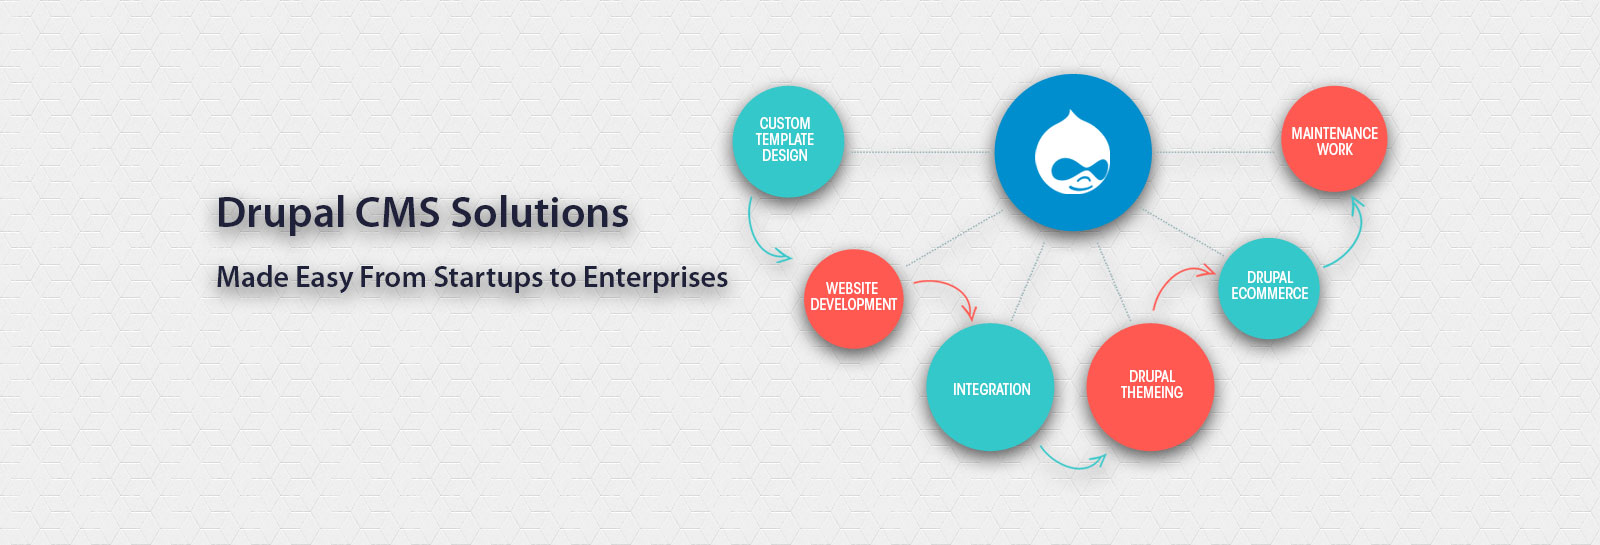 drupal theme development and integration services